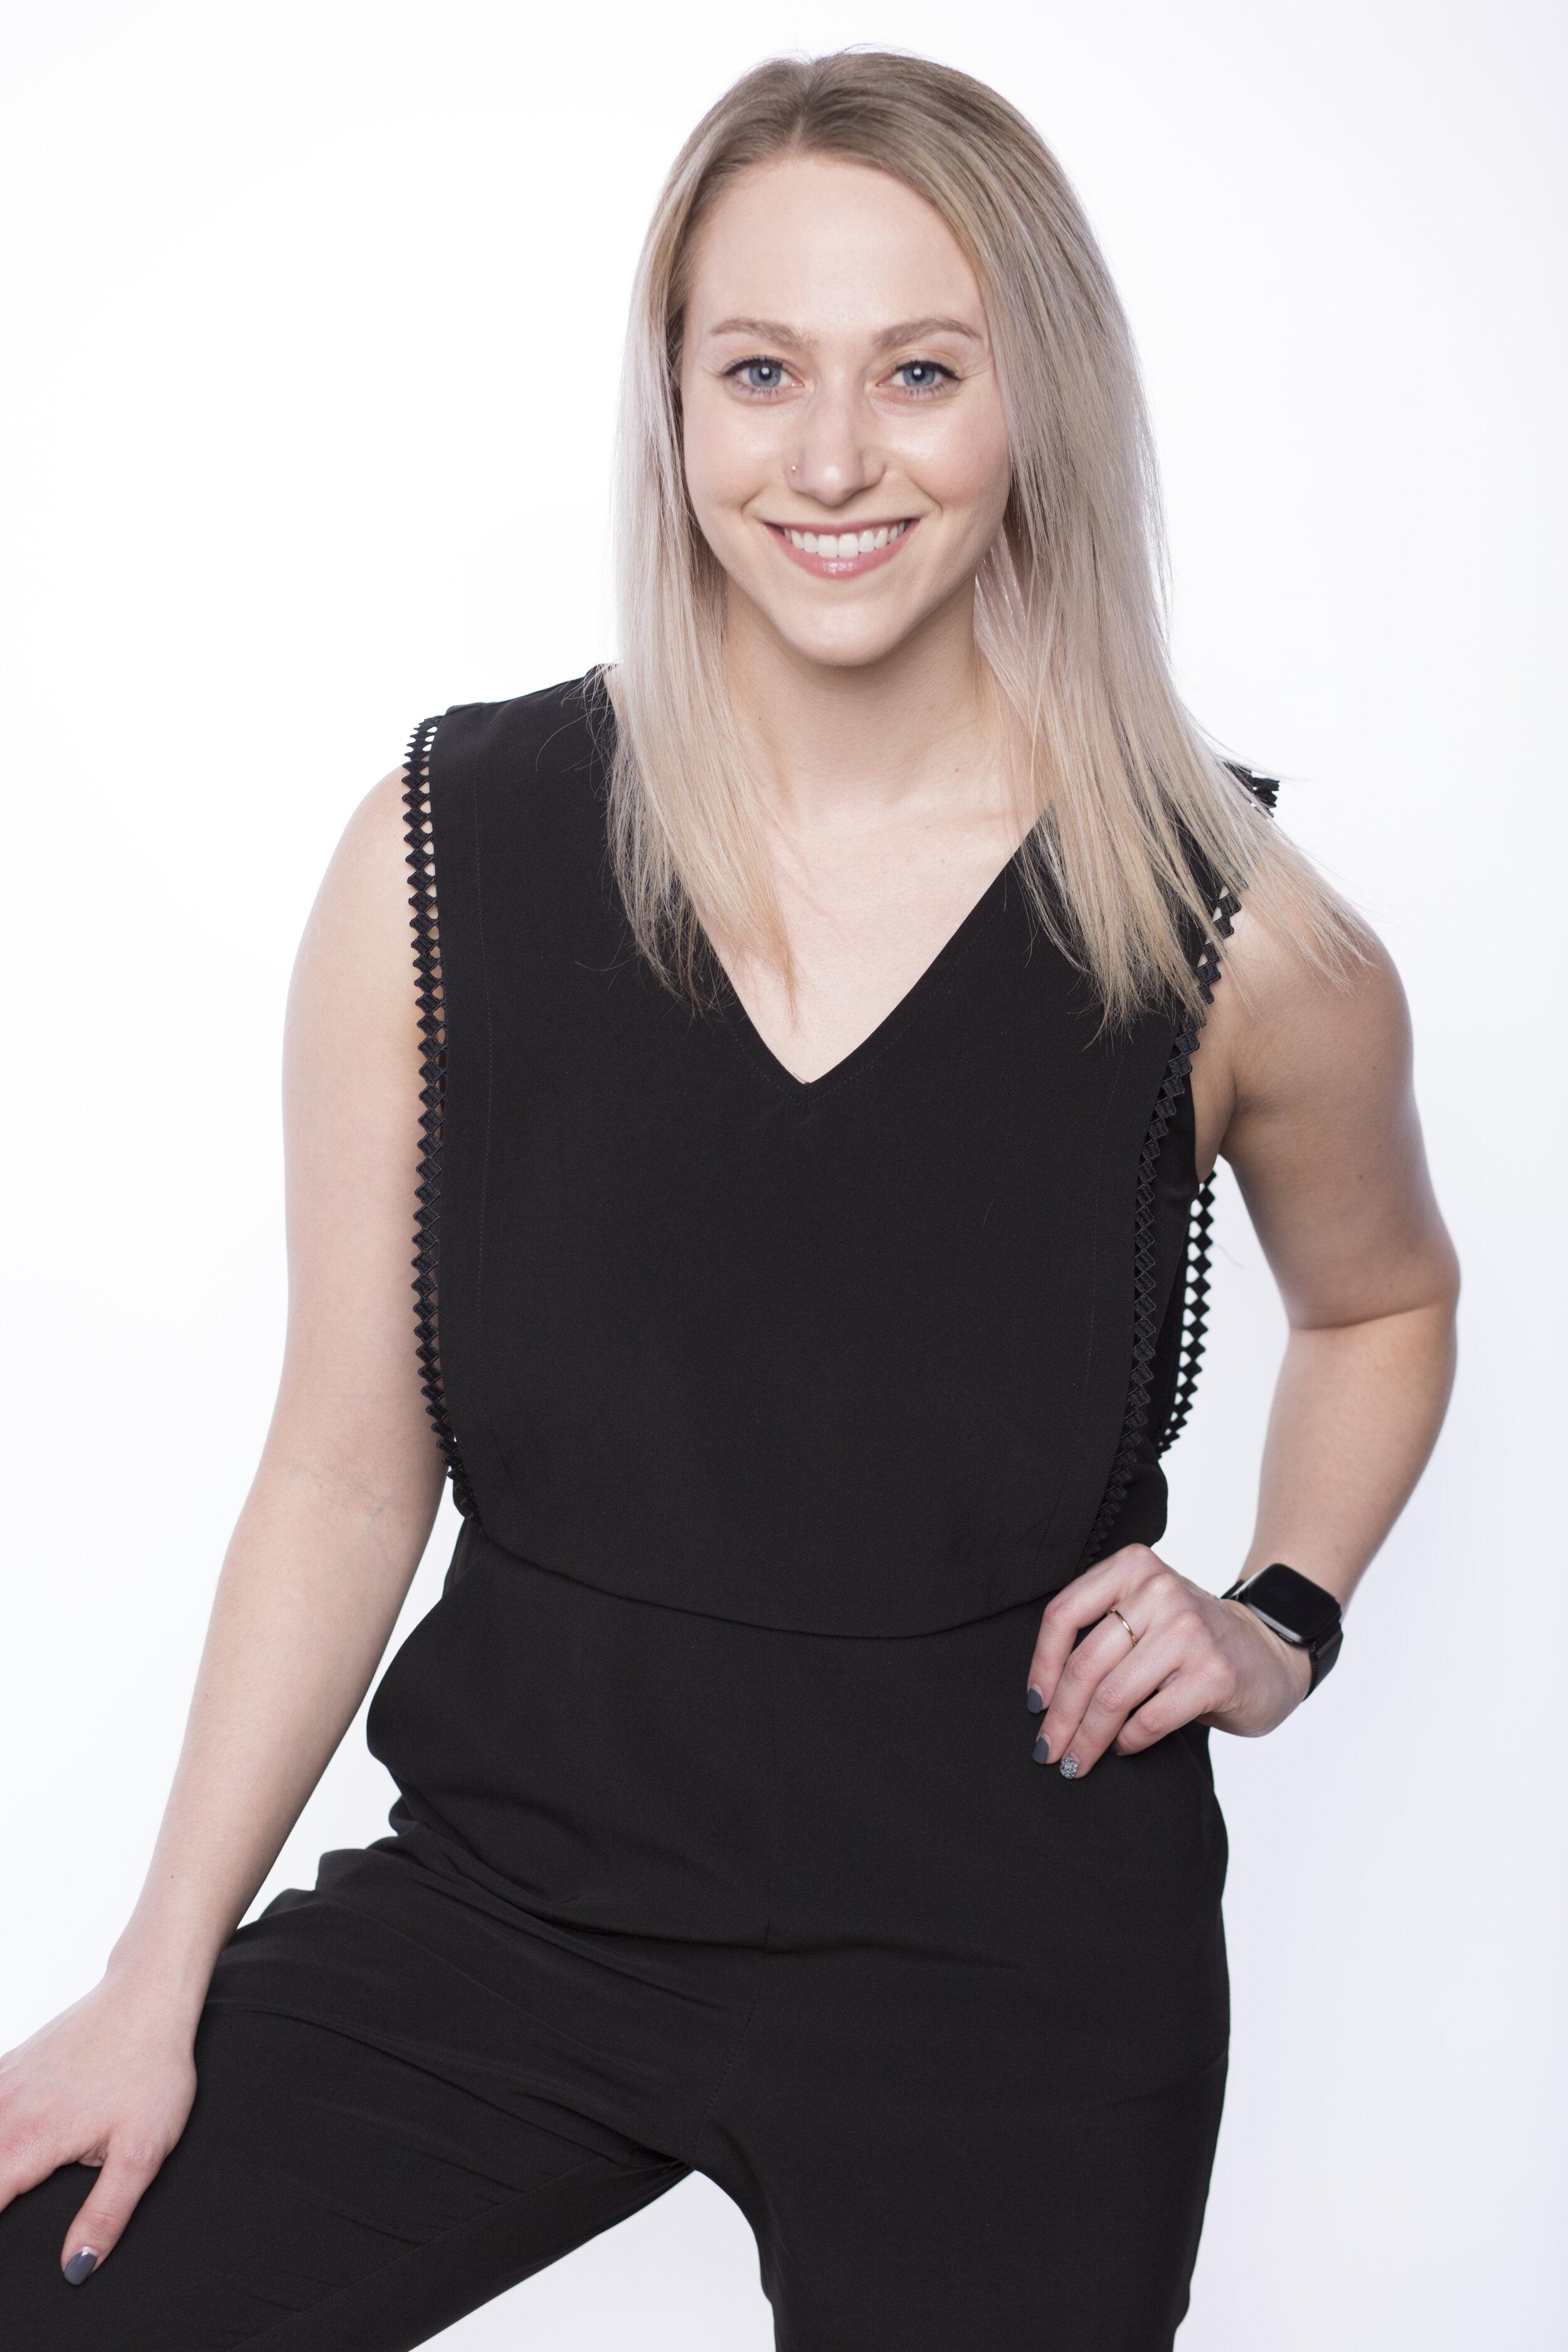 Mackenzie Holmes - Reputation Management and Training Specialist